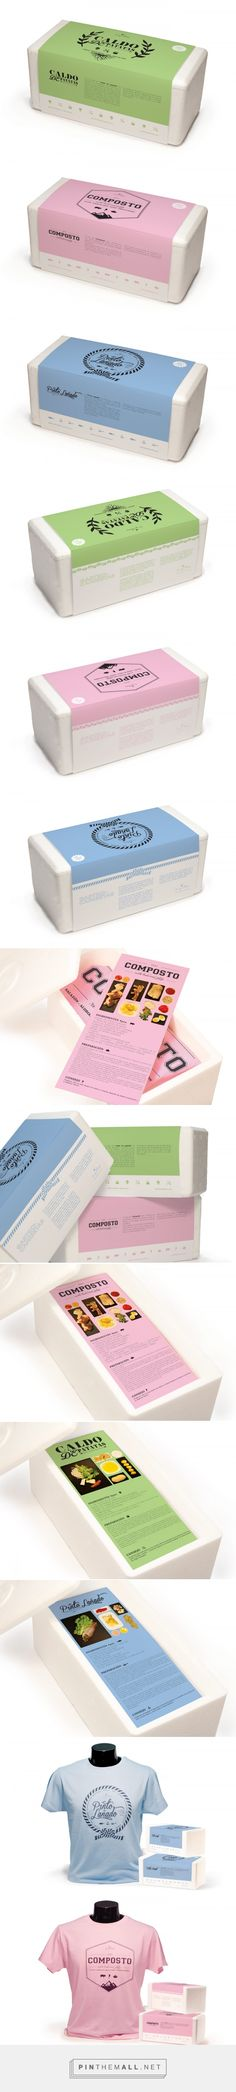 Gastrocamisetas 2016 - Packaging of the World - Creative Package Design Gallery…